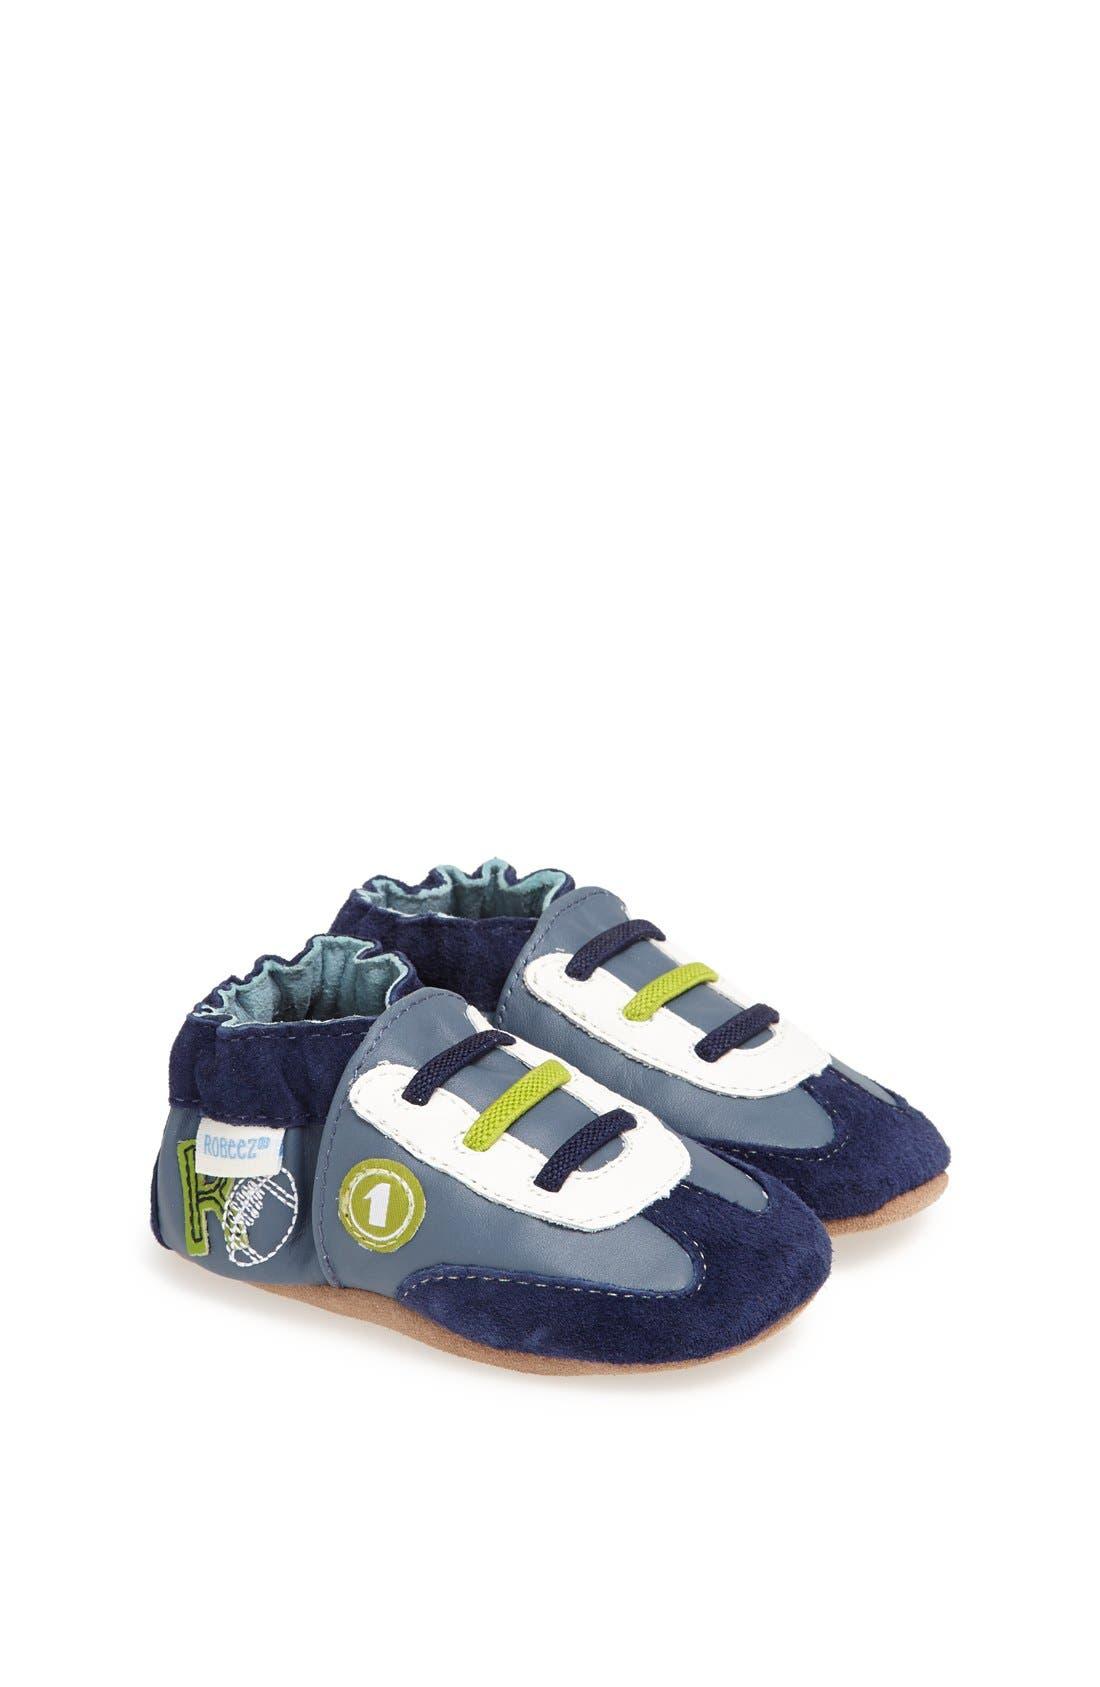 Alternate Image 1 Selected - Robeez® 'All Star Rodney' Crib Shoe (Baby & Walker)